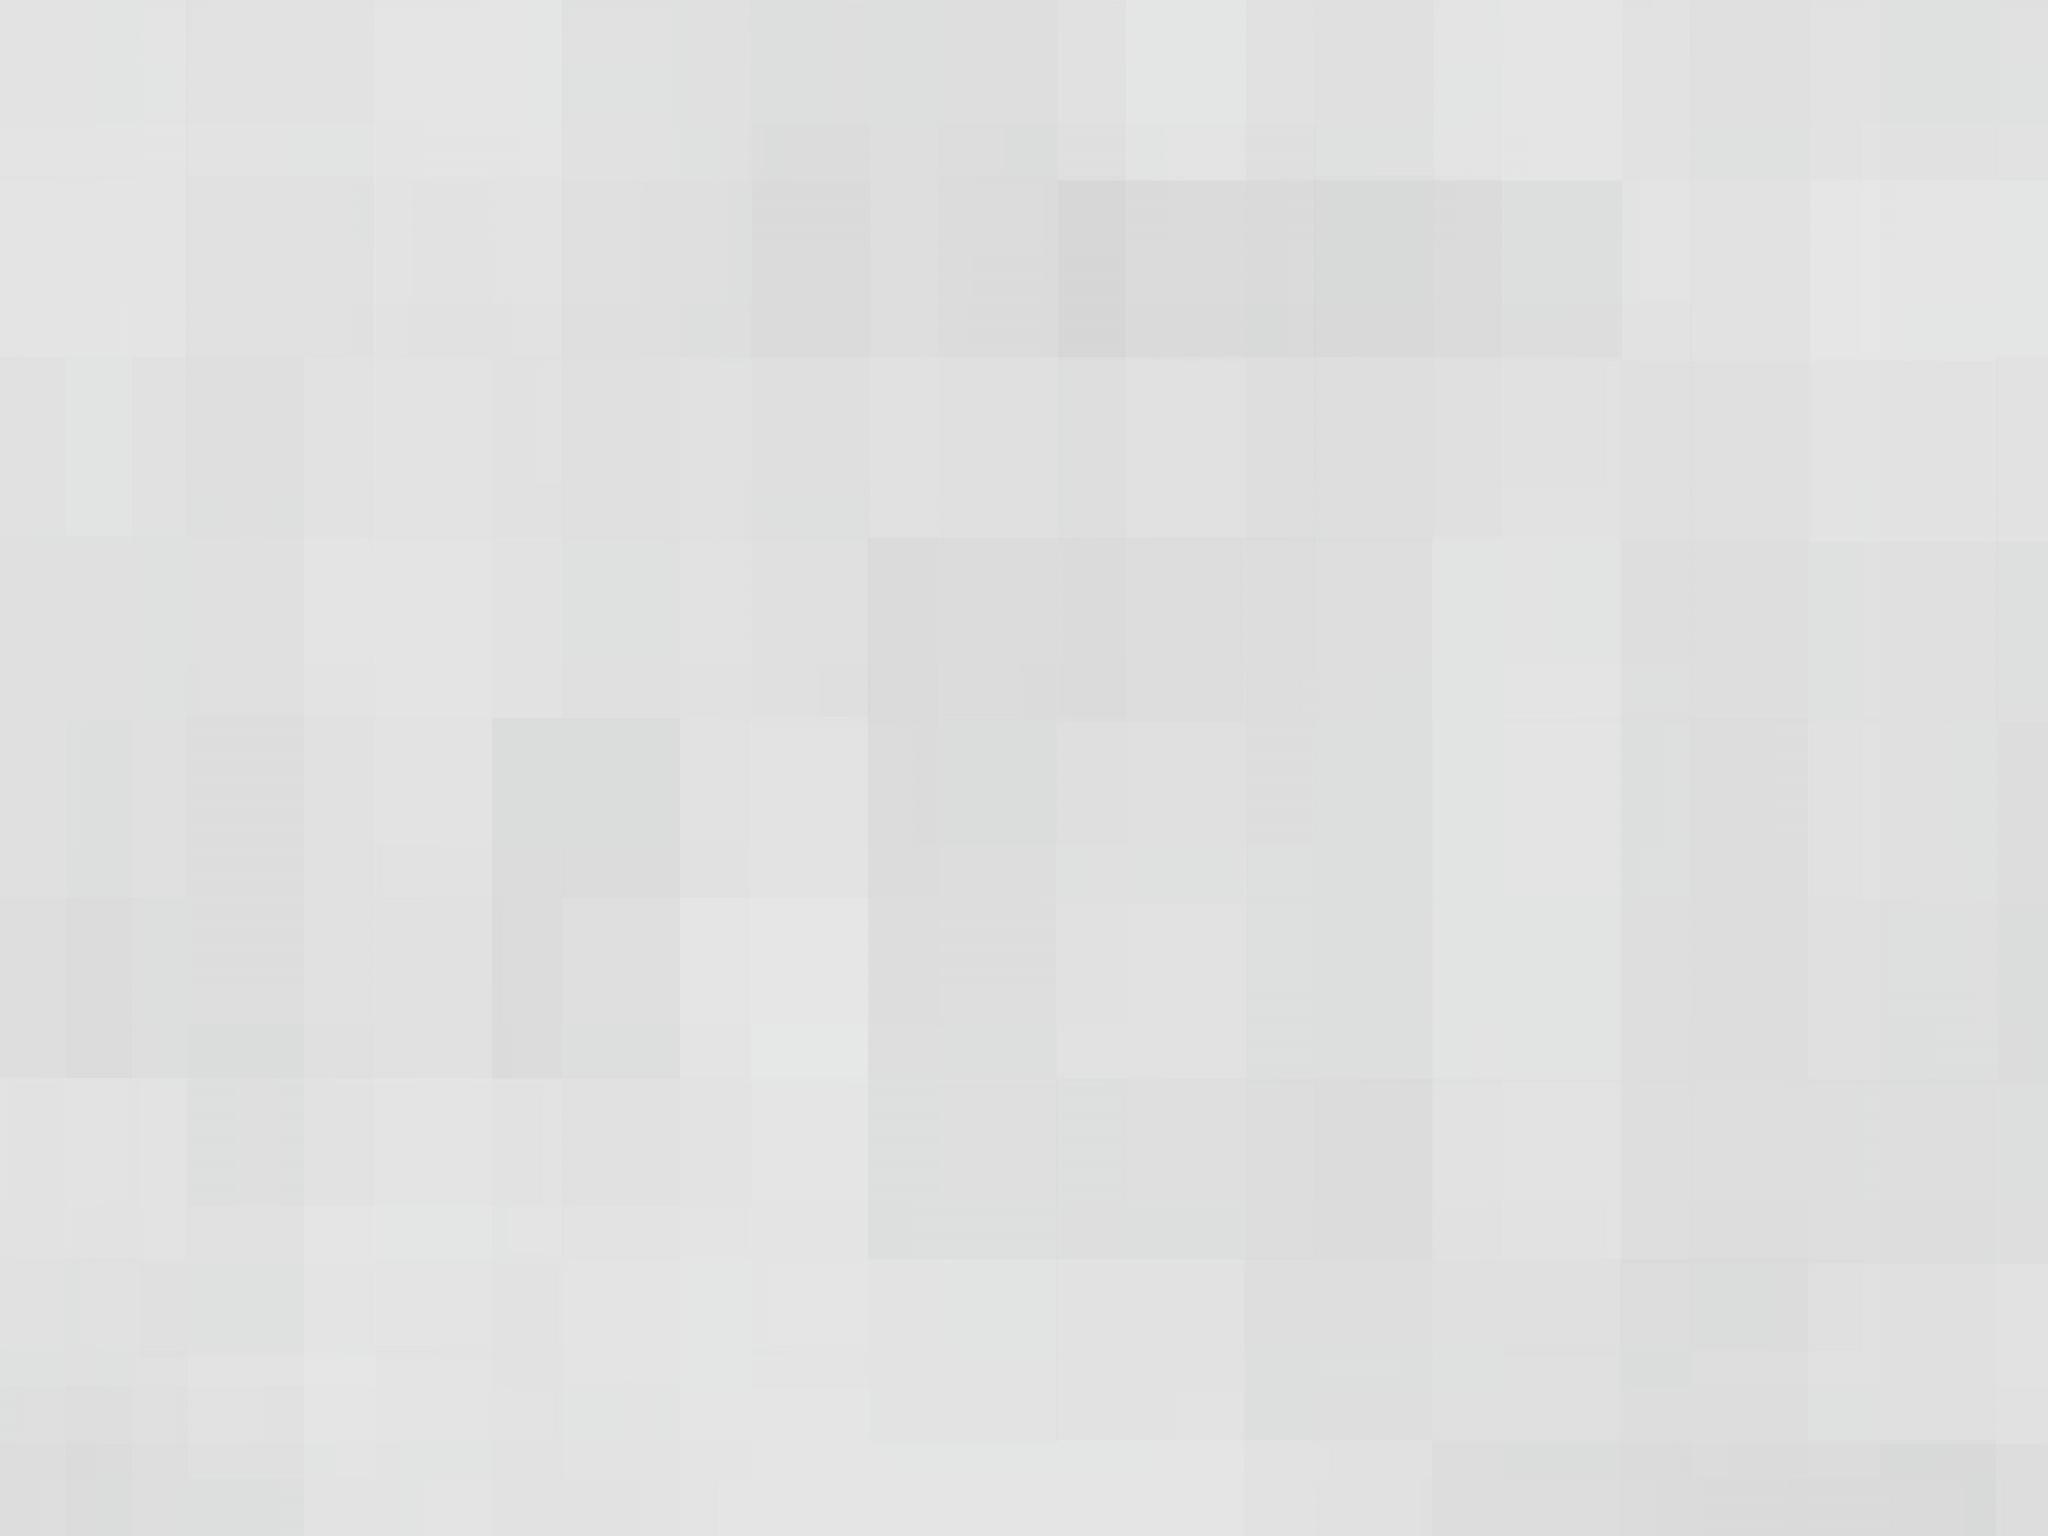 Layered-Gray-Squares-2048x1536-39